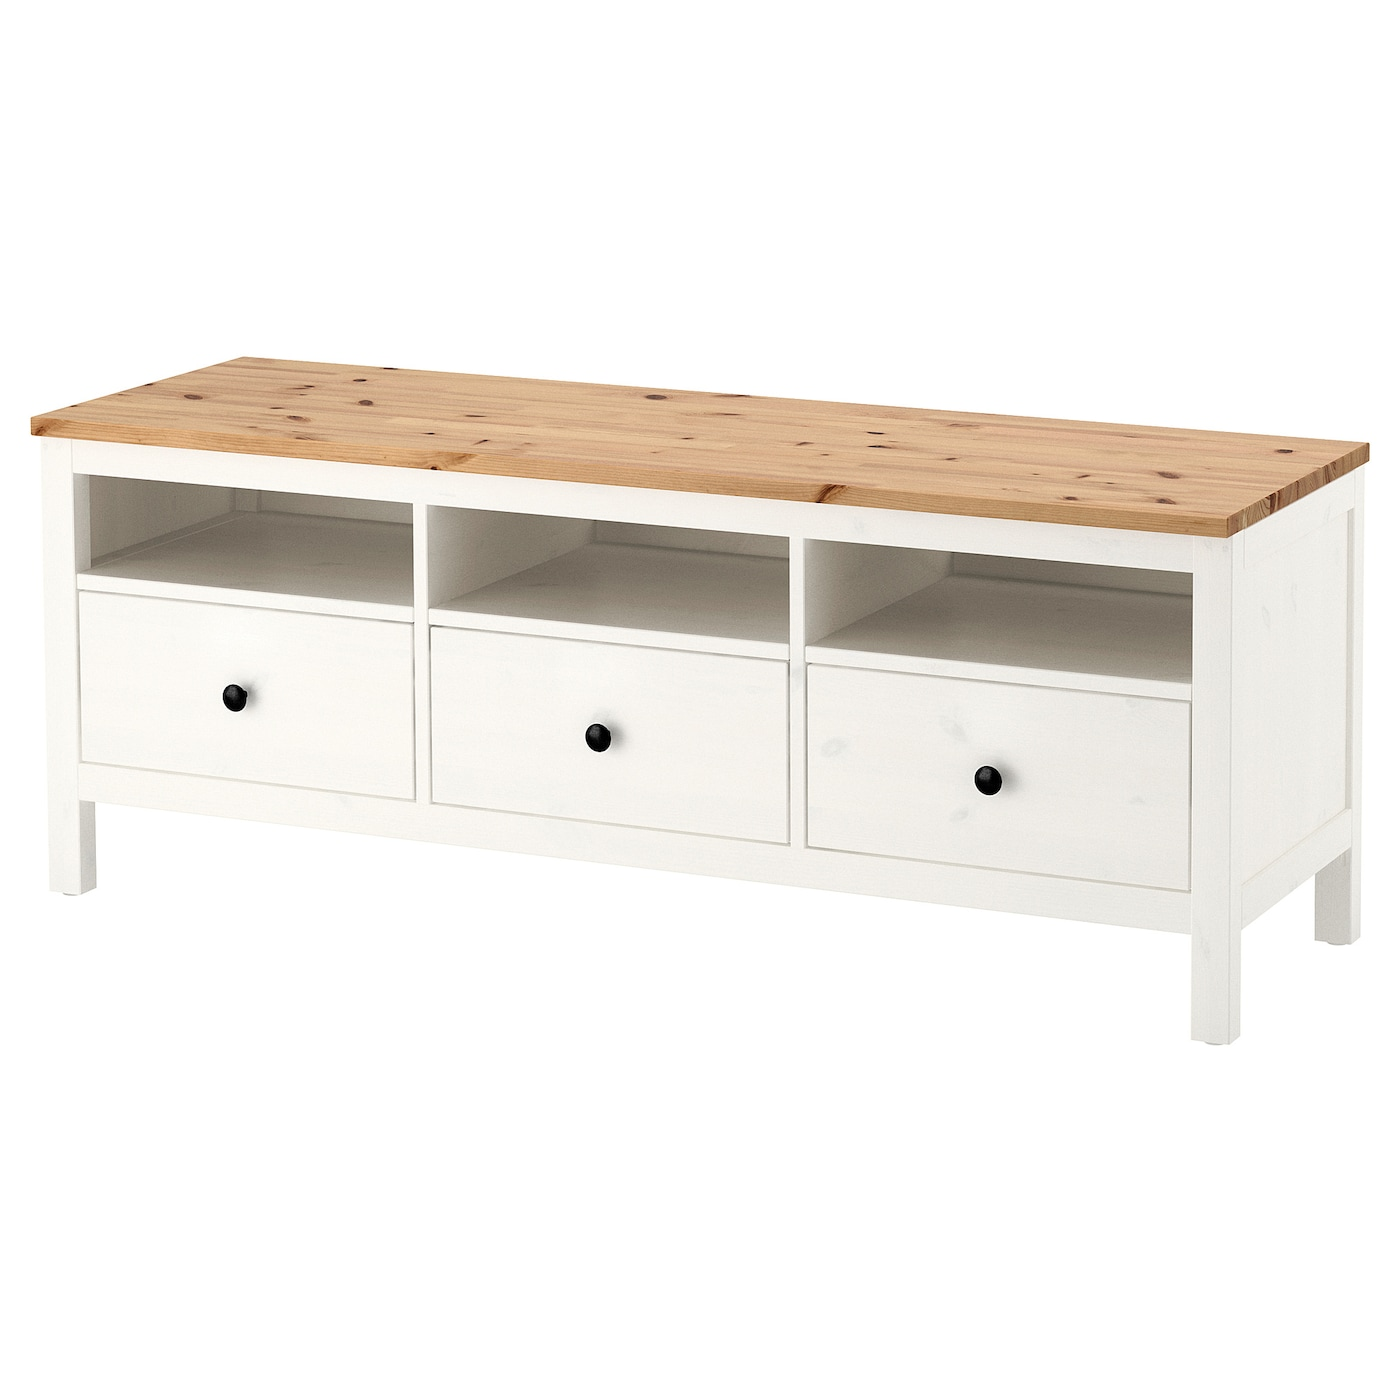 Hemnes Ikea Tv Kast.Hemnes Tv Unit White Stain Light Brown 58 1 4x18 1 2x22 1 2 Ikea